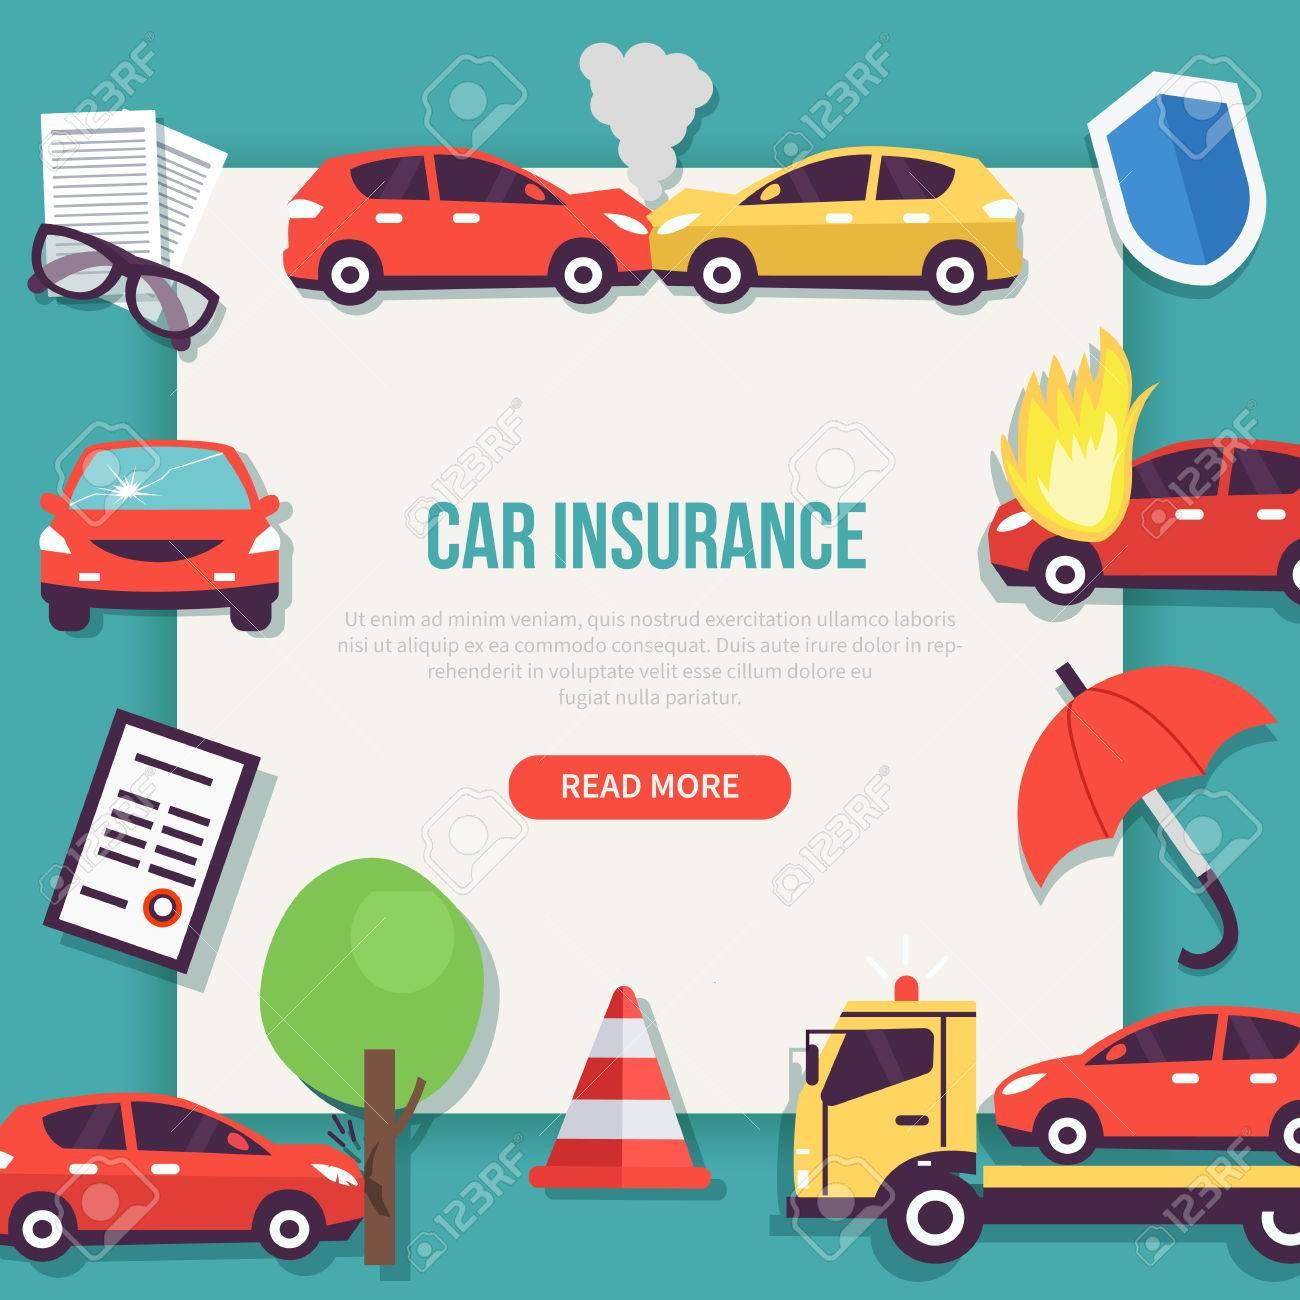 Types Of Car Insurance >> Car Insurance Web Banner Types Of Insurance Cases Vector Illustration